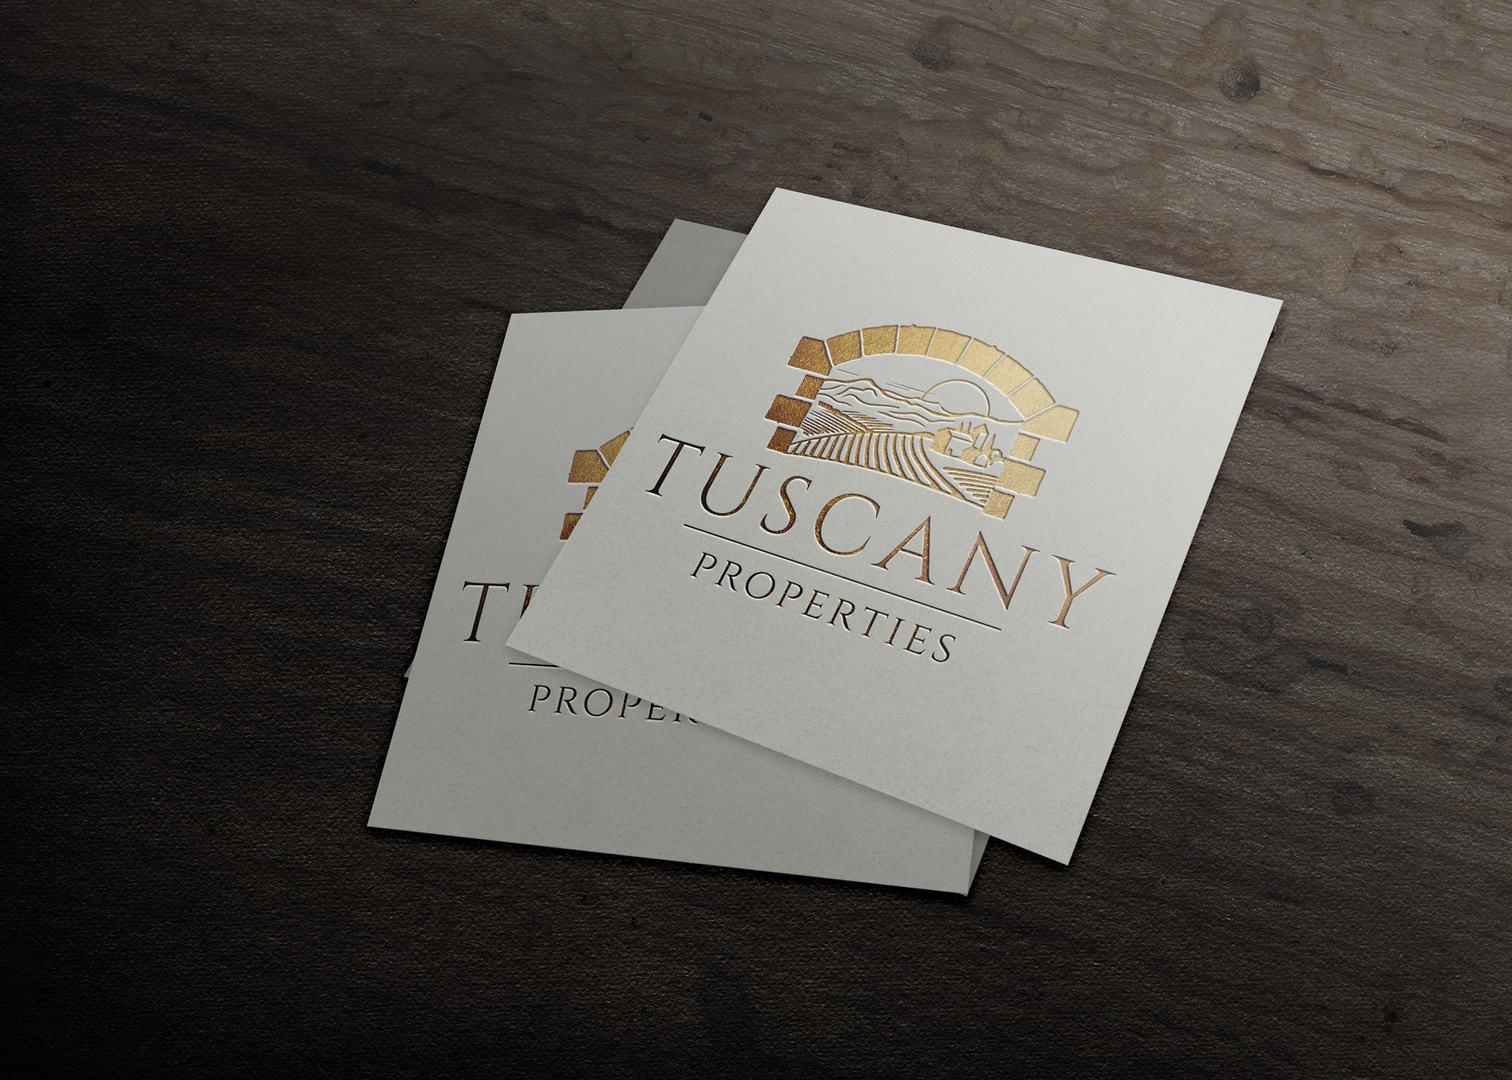 Tuscany Properties